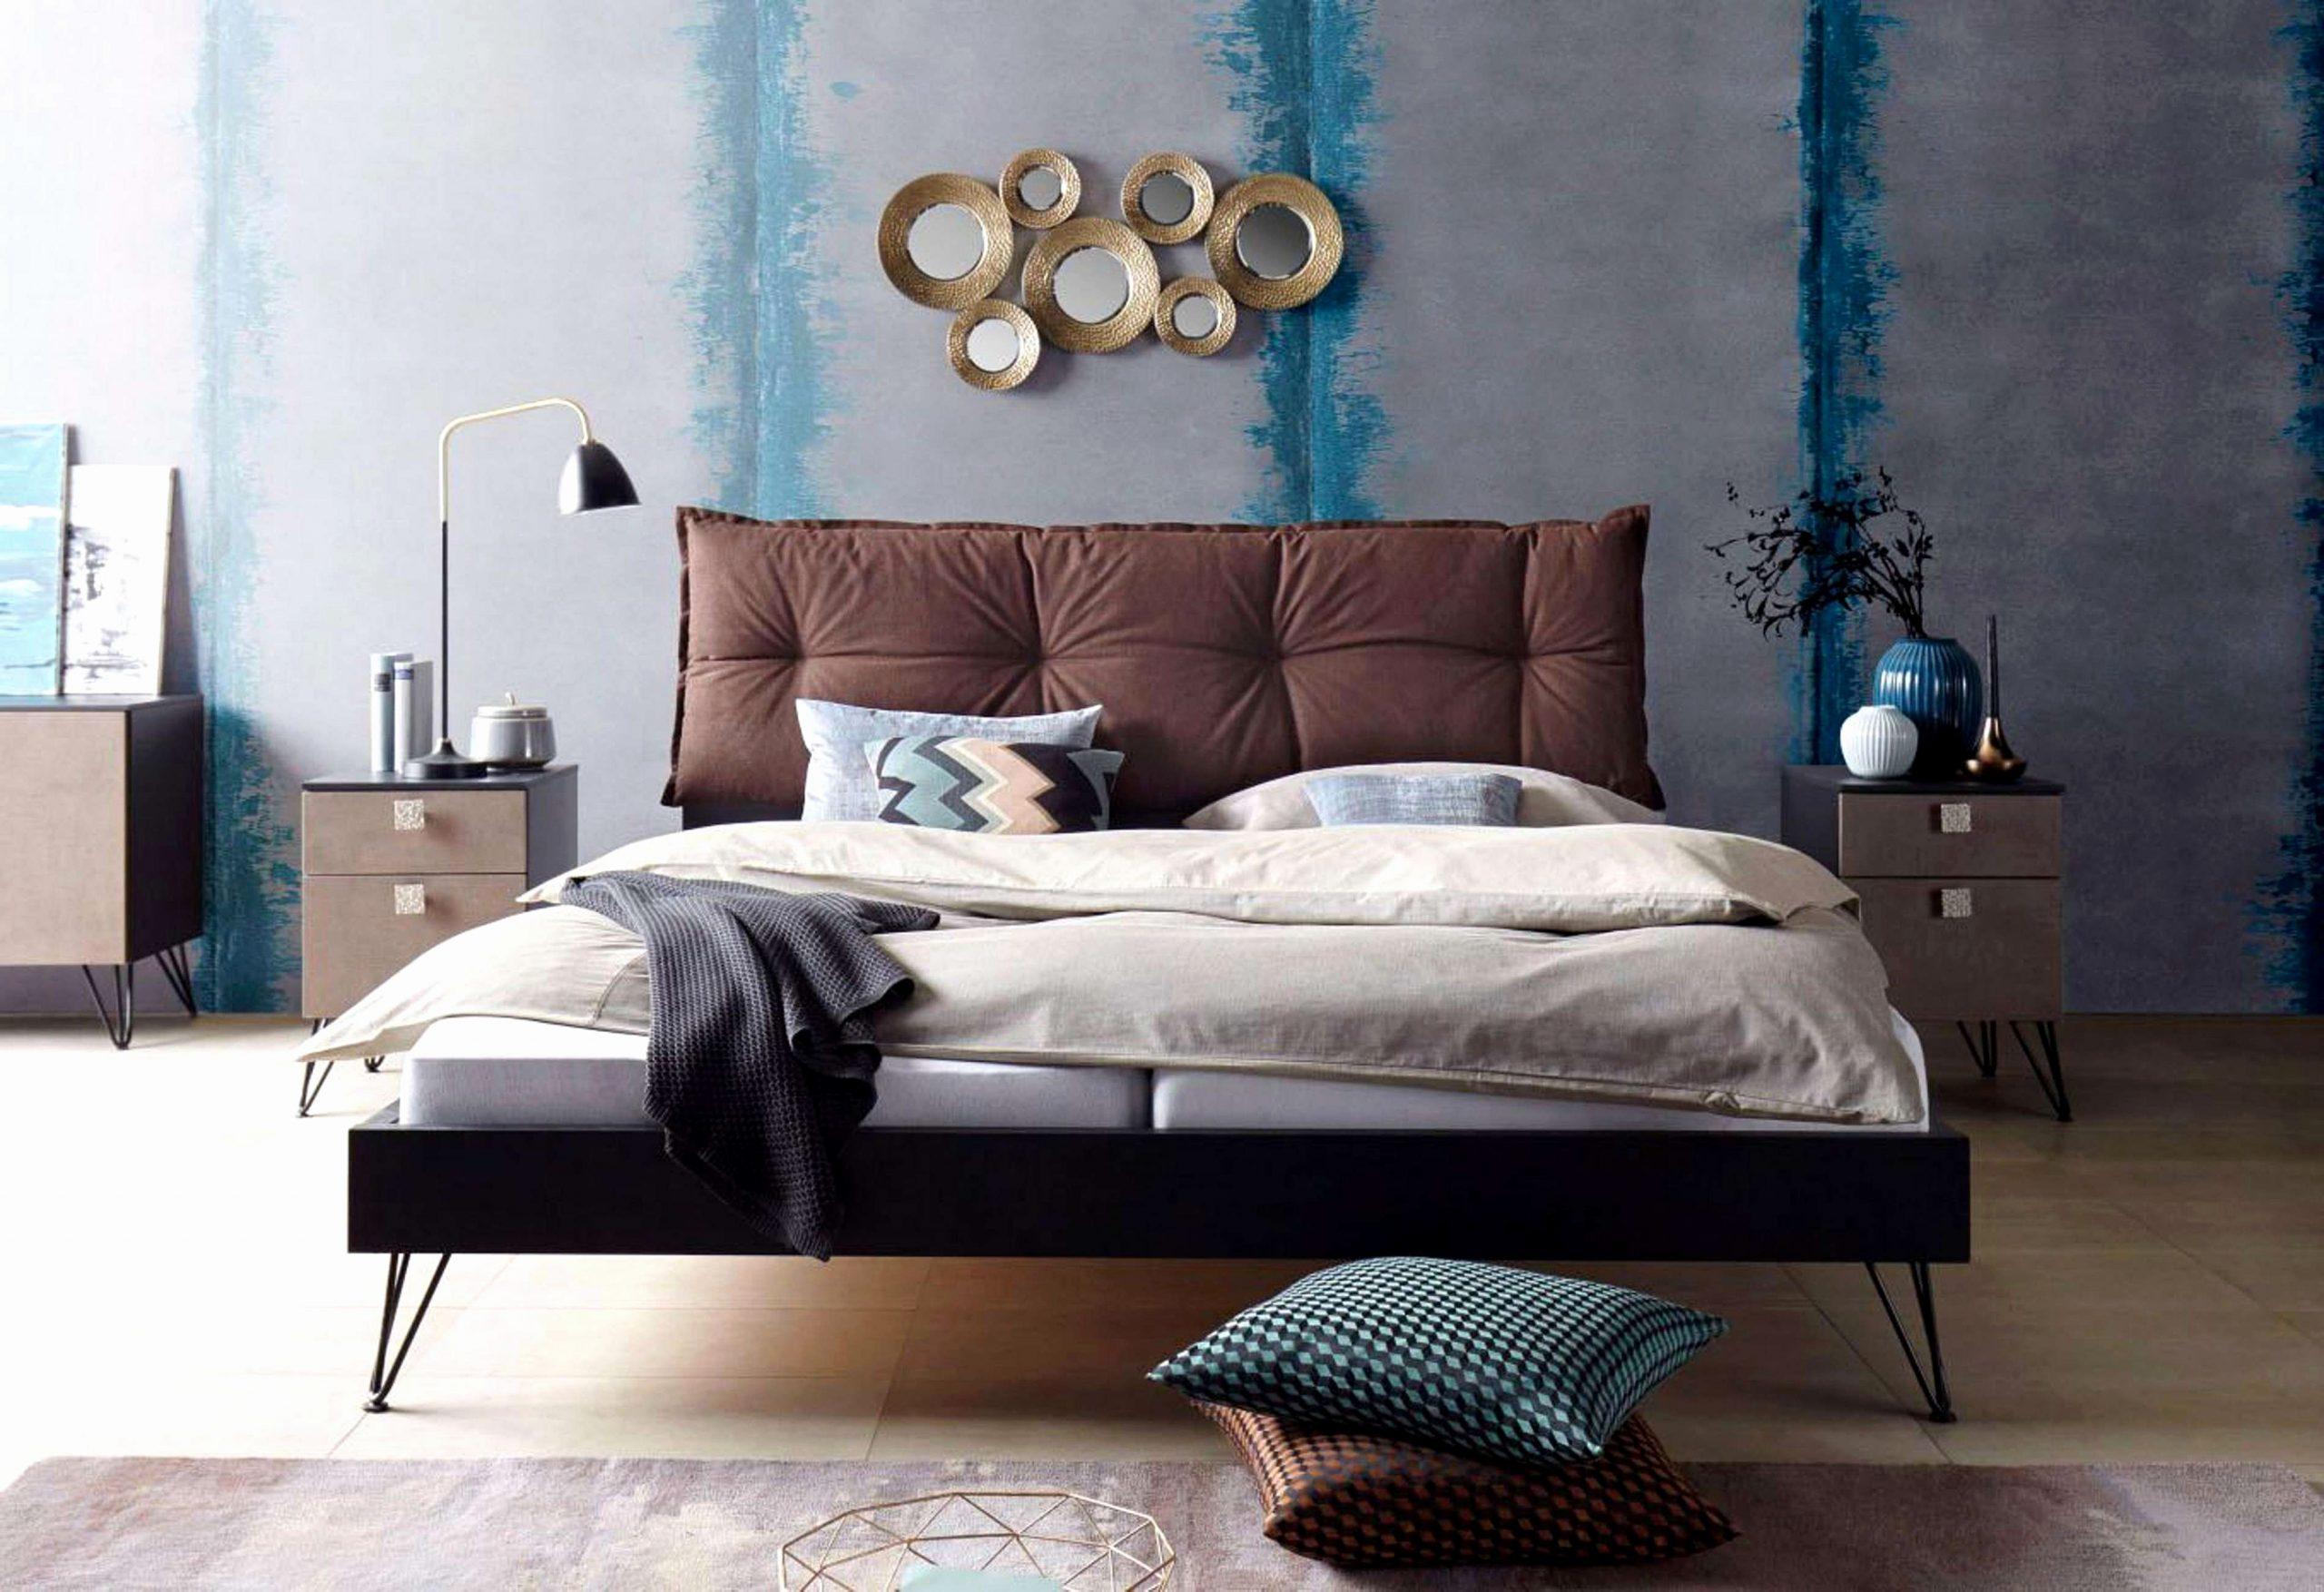 Full Size of Bestes Bett 41 R1 Der Welt Fhrung Weiße Betten Skandinavisch Romantisches 160x200 Kleinkind Kopfteil Modern Design Komplett Tatami Weiß 90x190 Mit Bett Bestes Bett